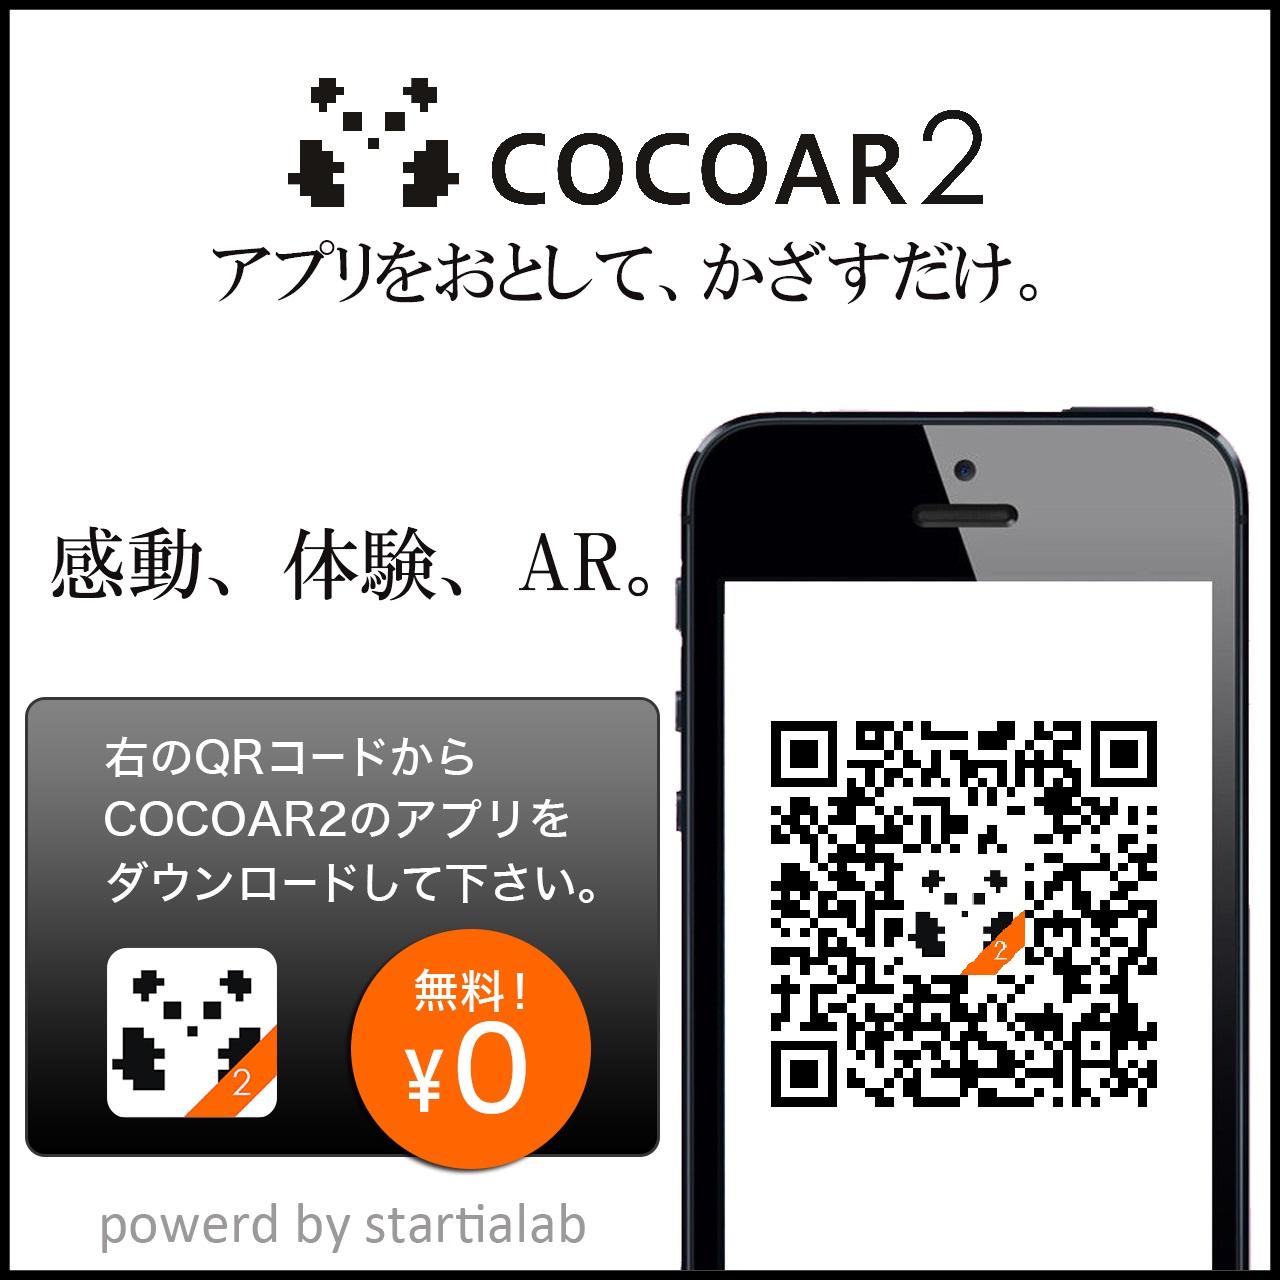 COCOAR2窶サ逋サ骭イ繝槭・繧ォ繝シ縺ク縺ョ菴ソ逕ィ縺ッ縺薙y驕諷ョ縺上◆繧吶&縺・cocoarQR